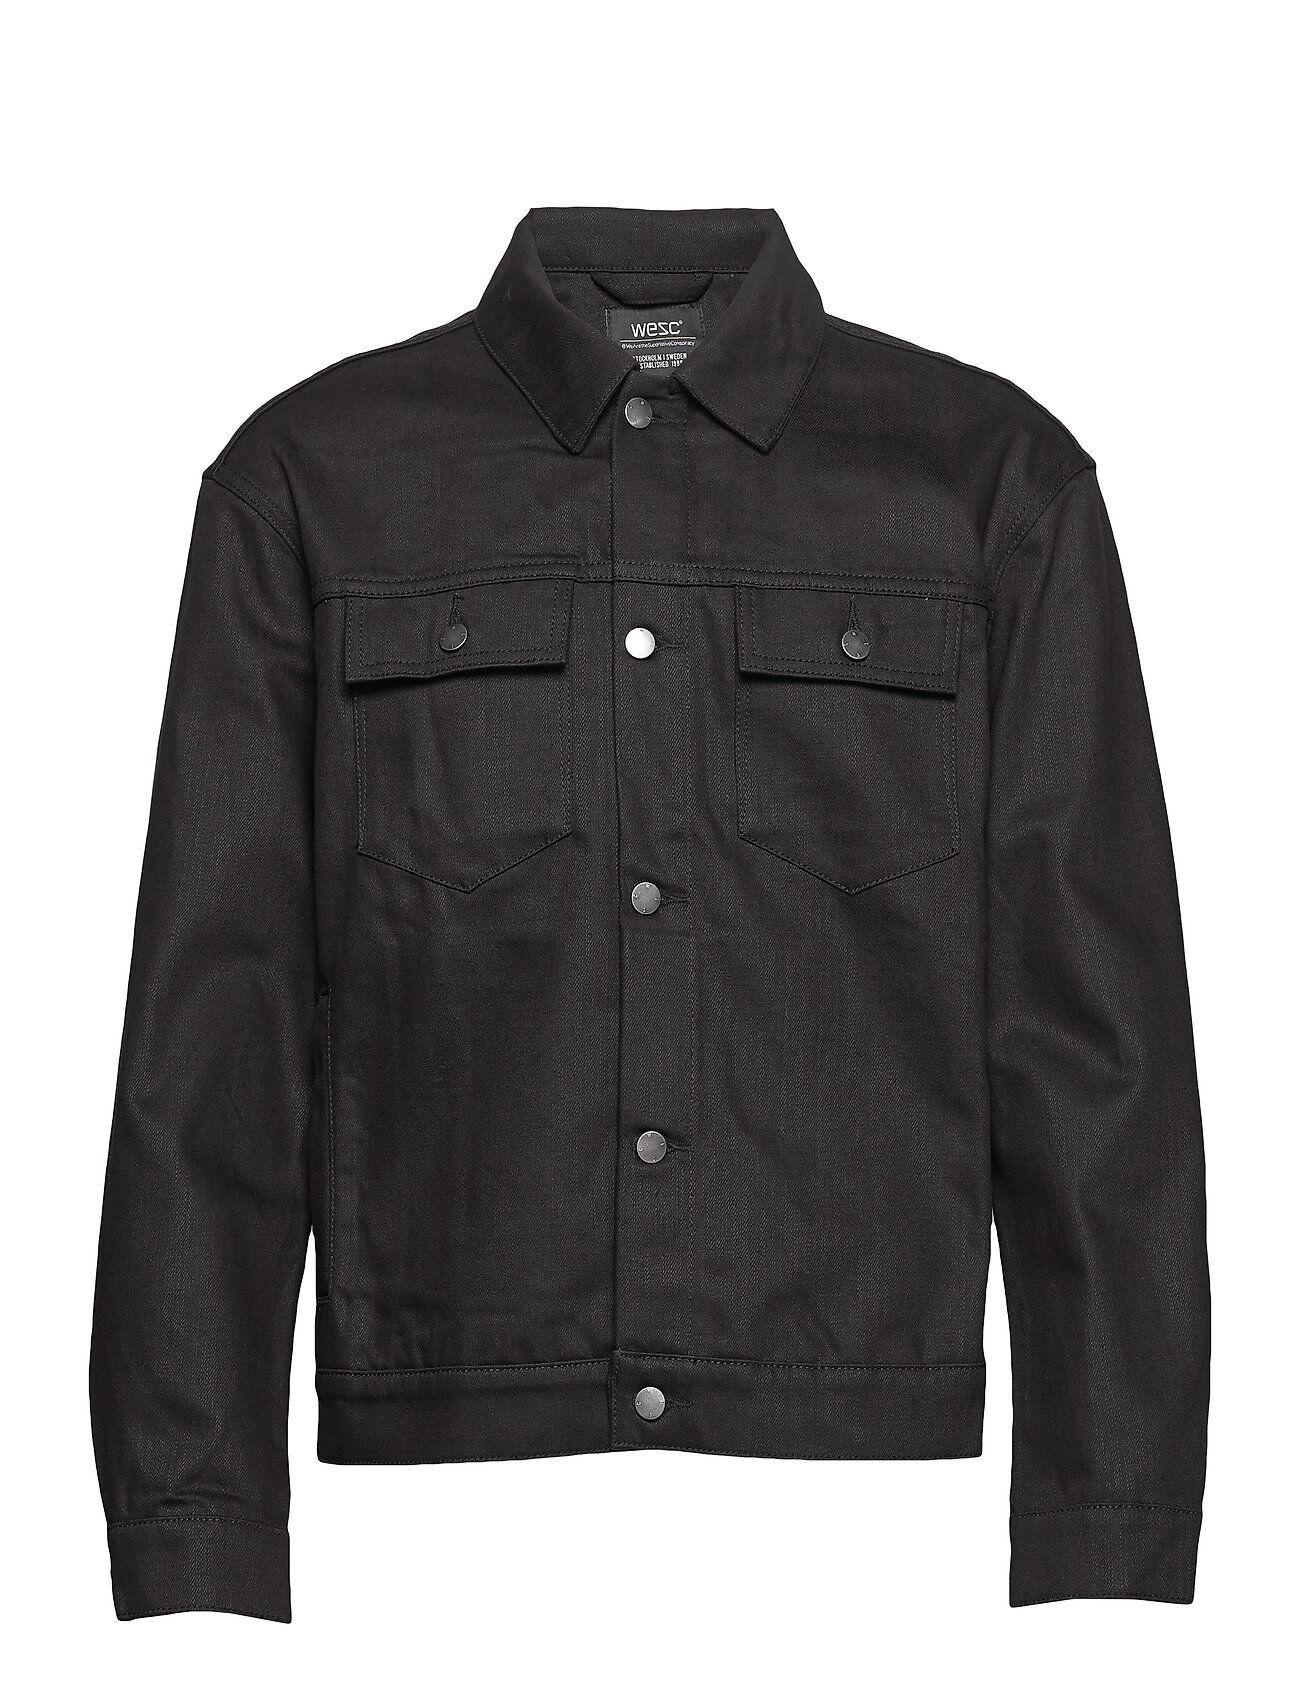 WeSC Denim Jacket Stay Black Farkkutakki Denimtakki Musta WeSC